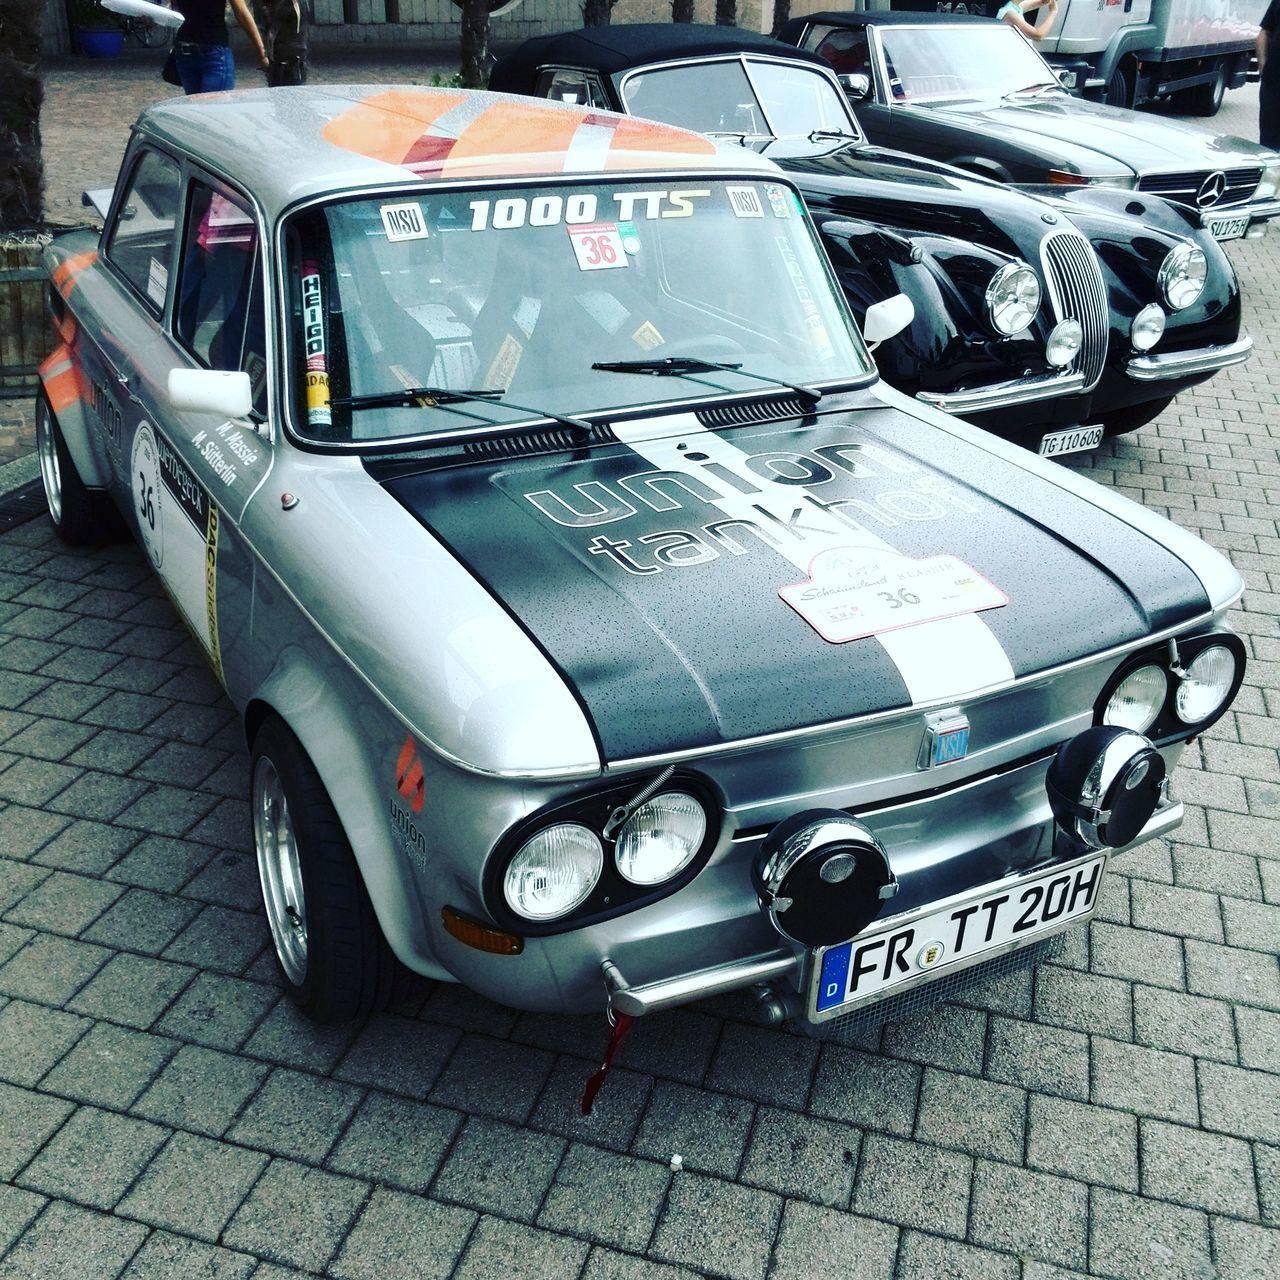 Nsu TTS Nsutts Racecar Freiburg Schauinsland Vintage Cars Classic Car Soloparking